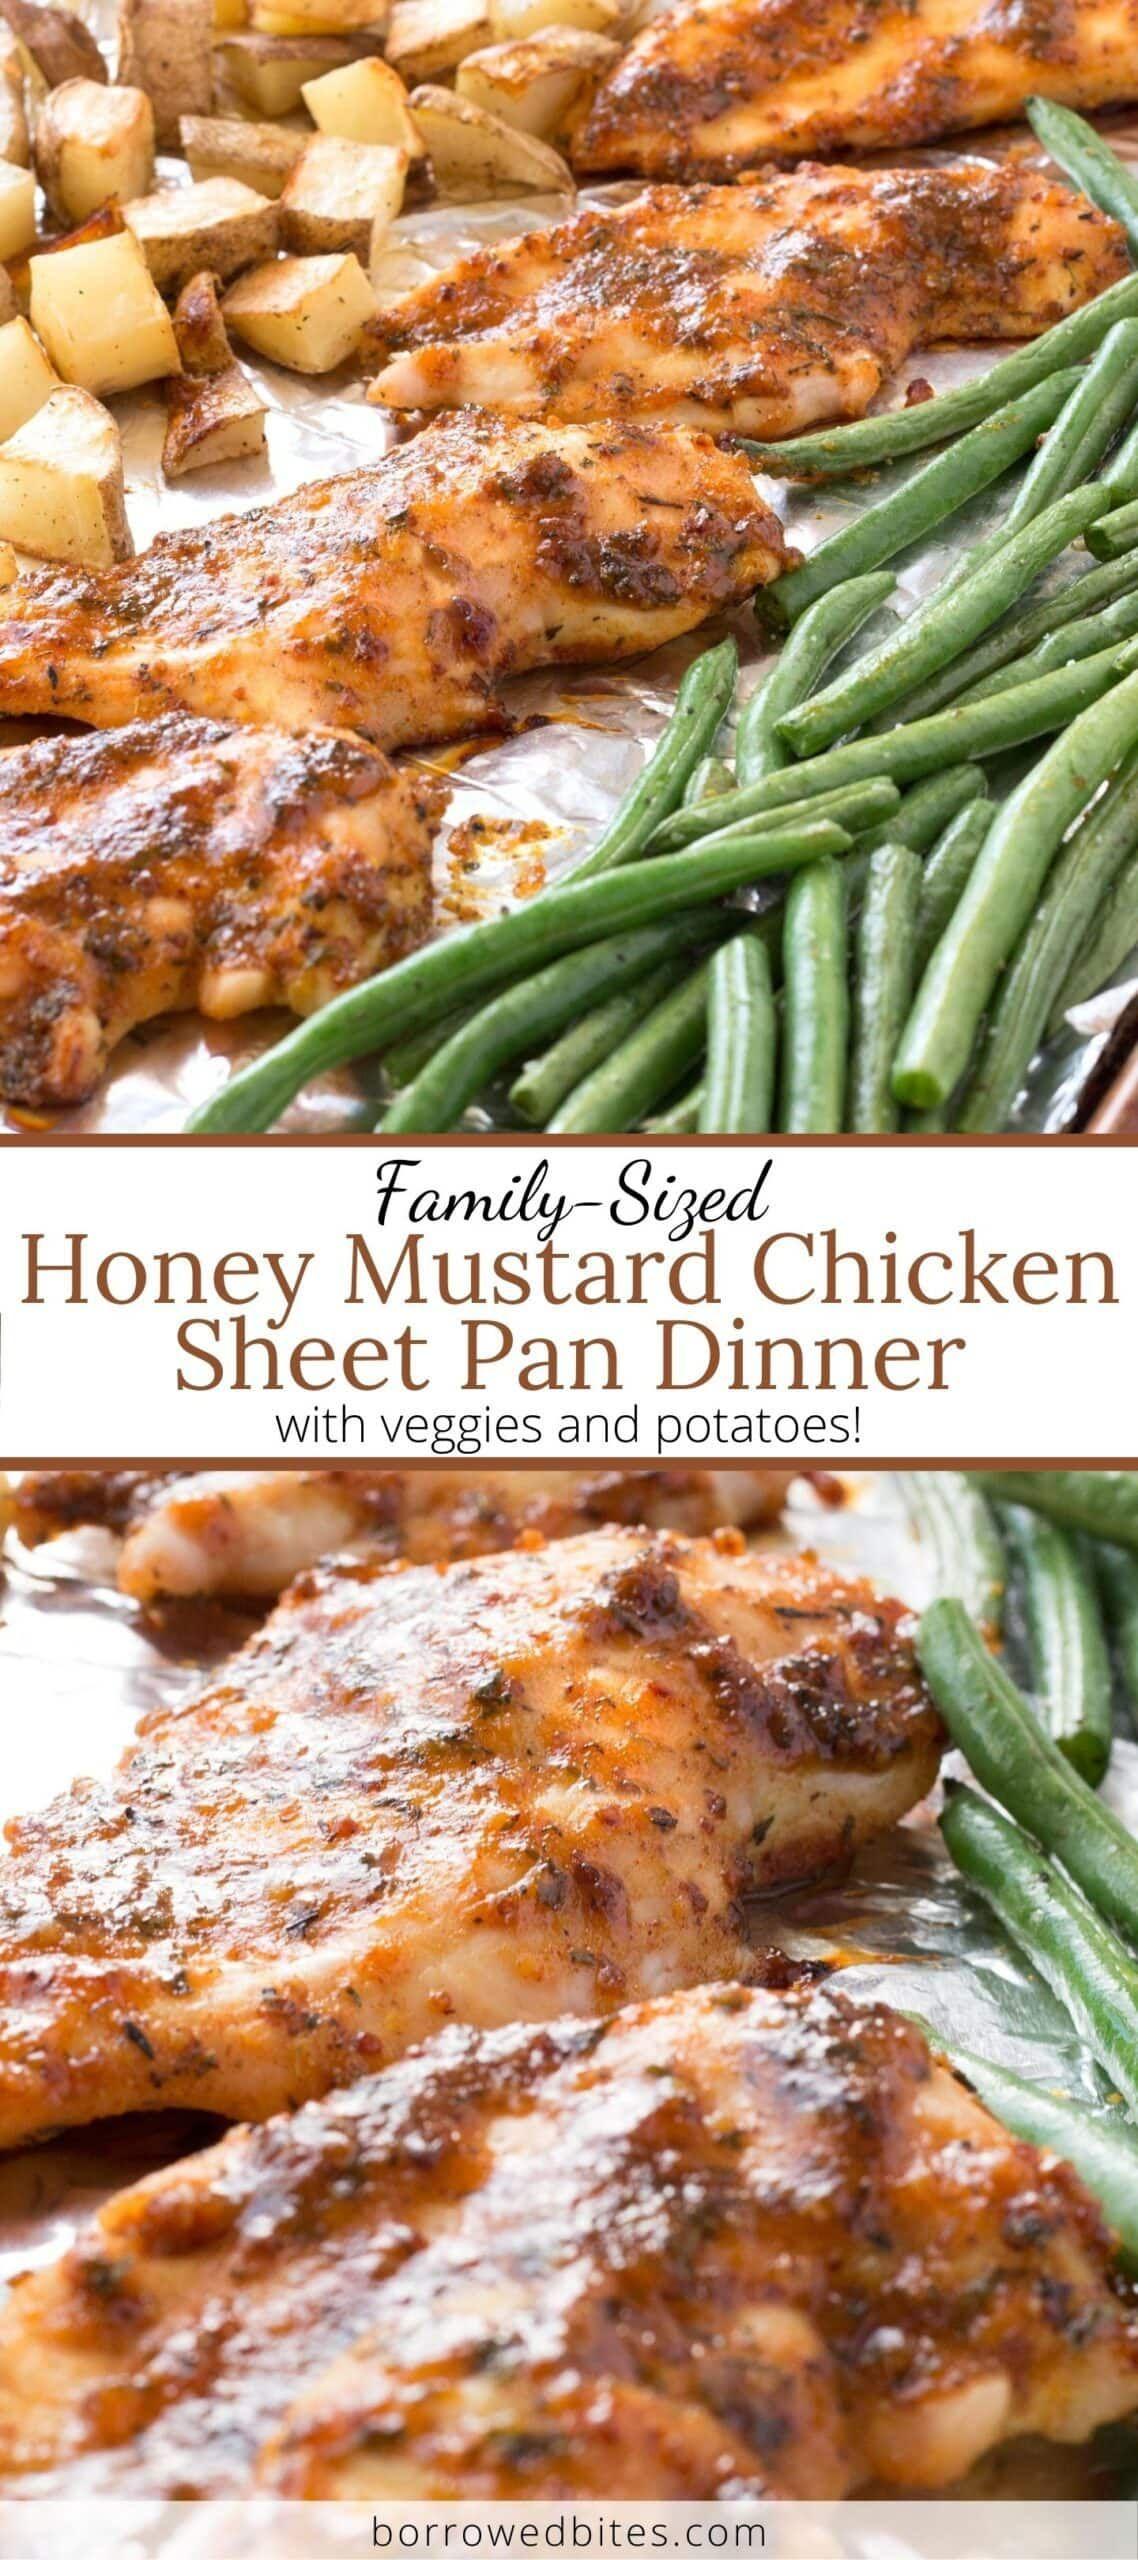 Honey Mustard Chicken Sheet Pan Dinner (with veggi